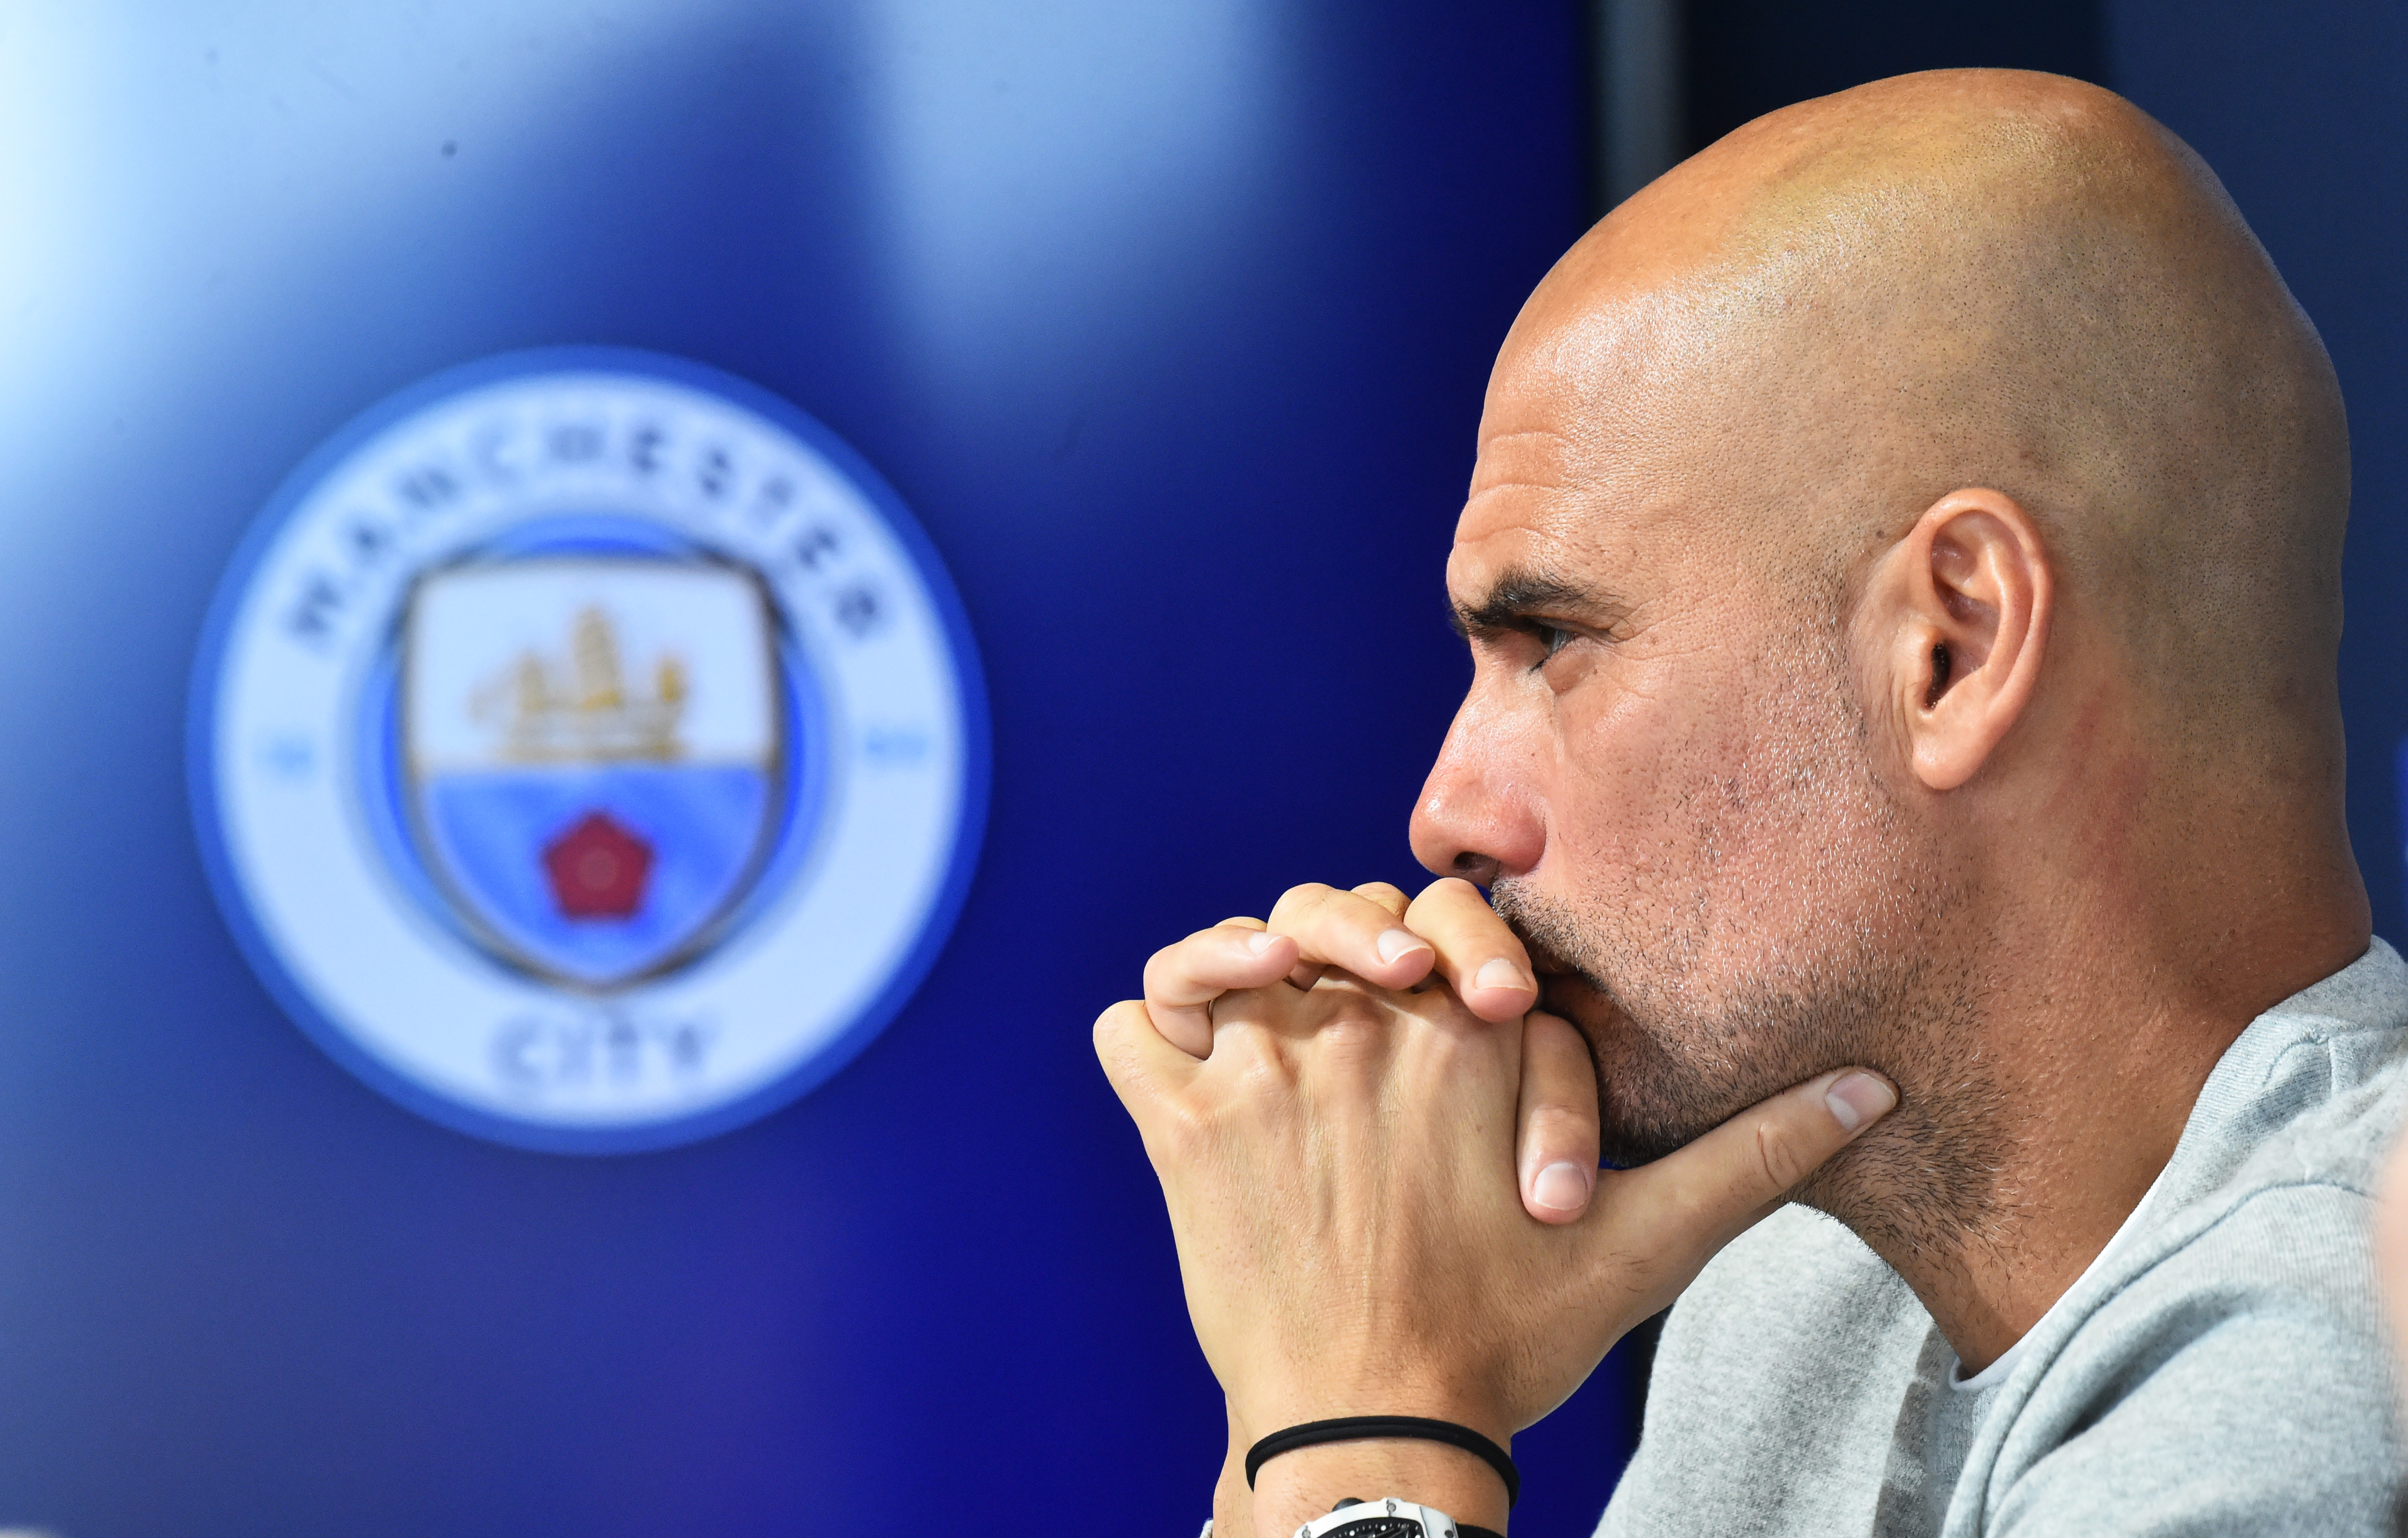 Aston Villa face a serious test against Manchester City